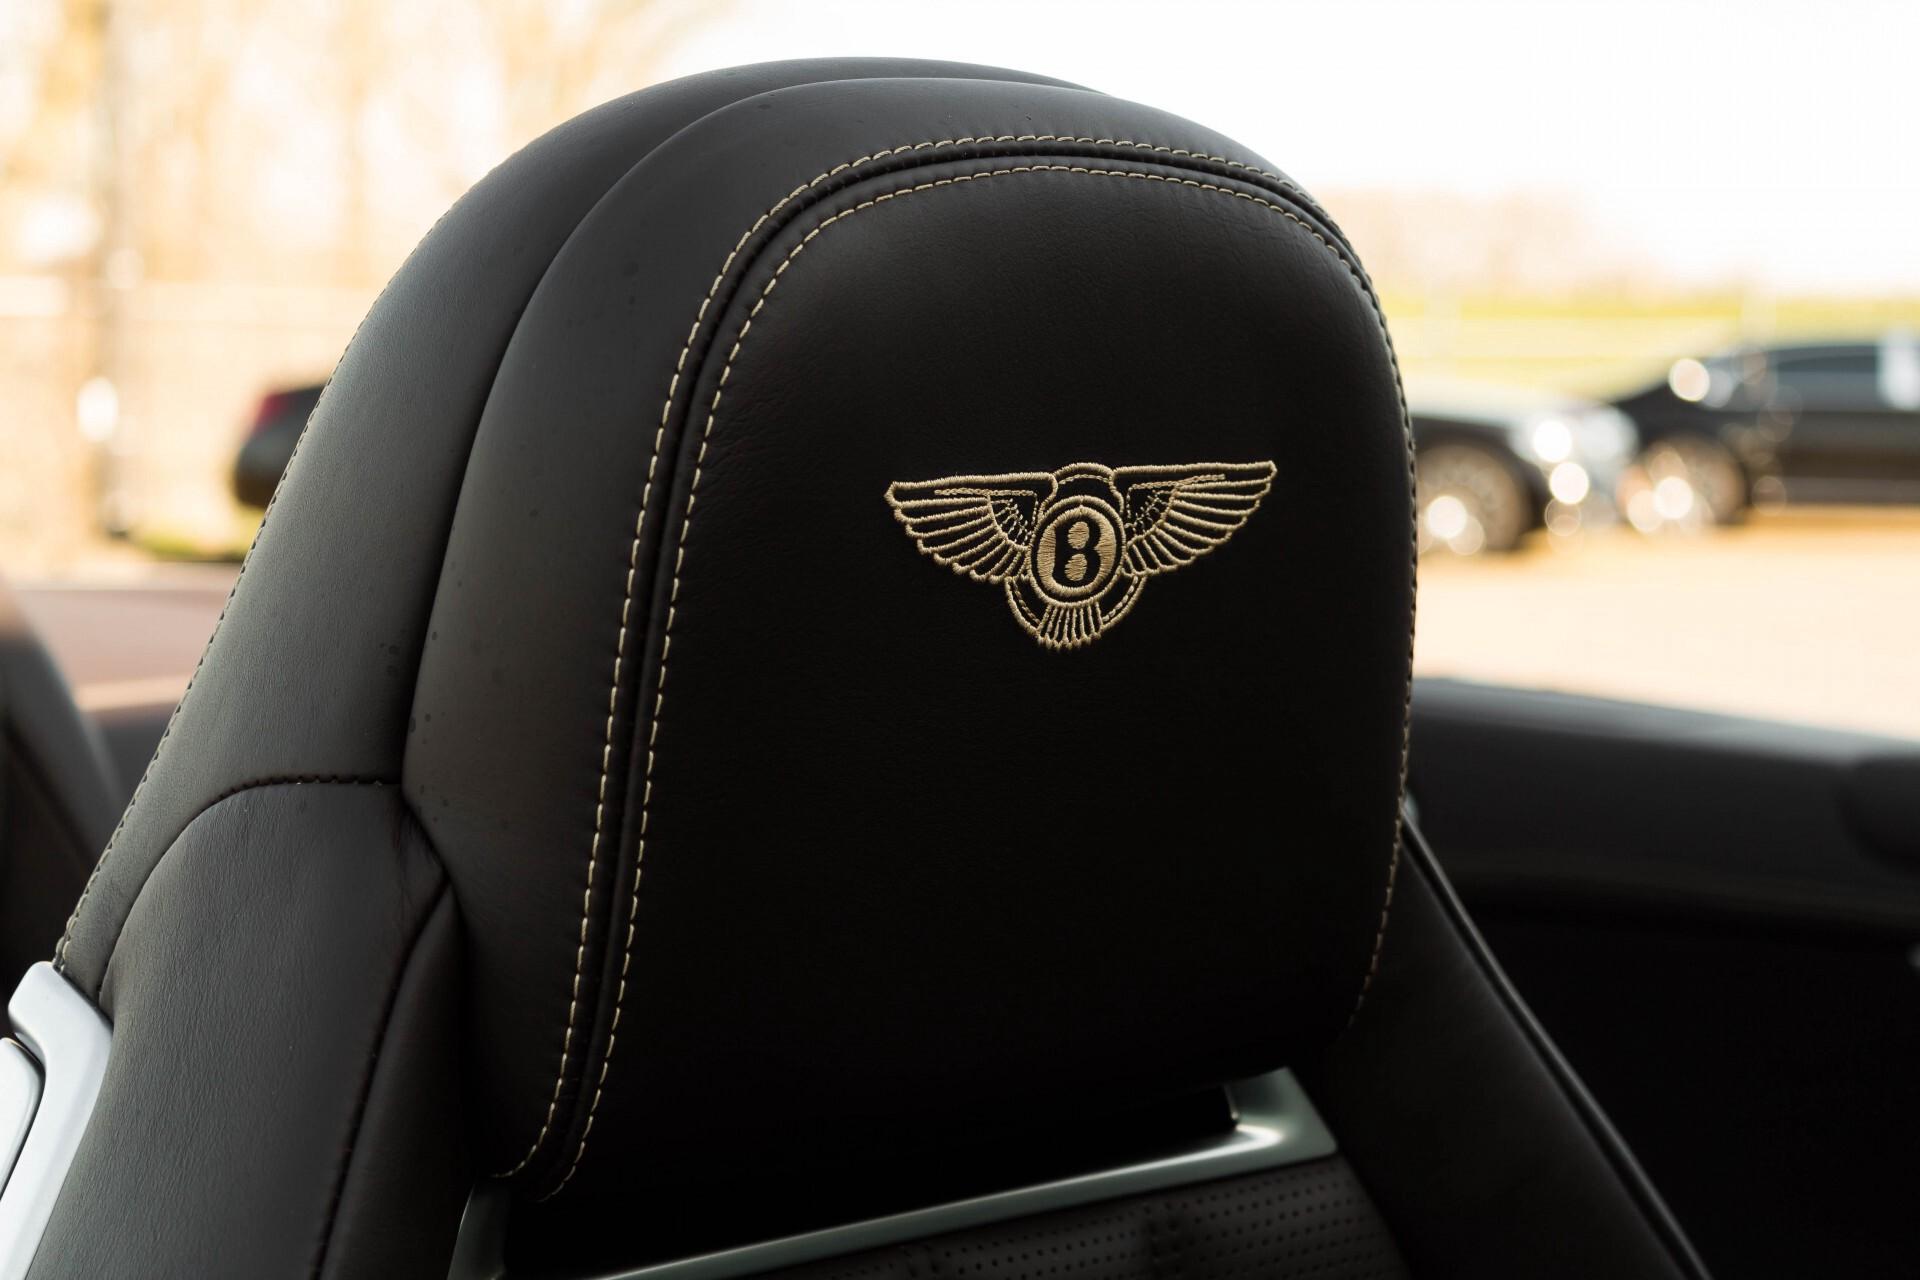 Bentley Continental GT 4.0 V8 GTC Aut7 Havannabruin Foto 21